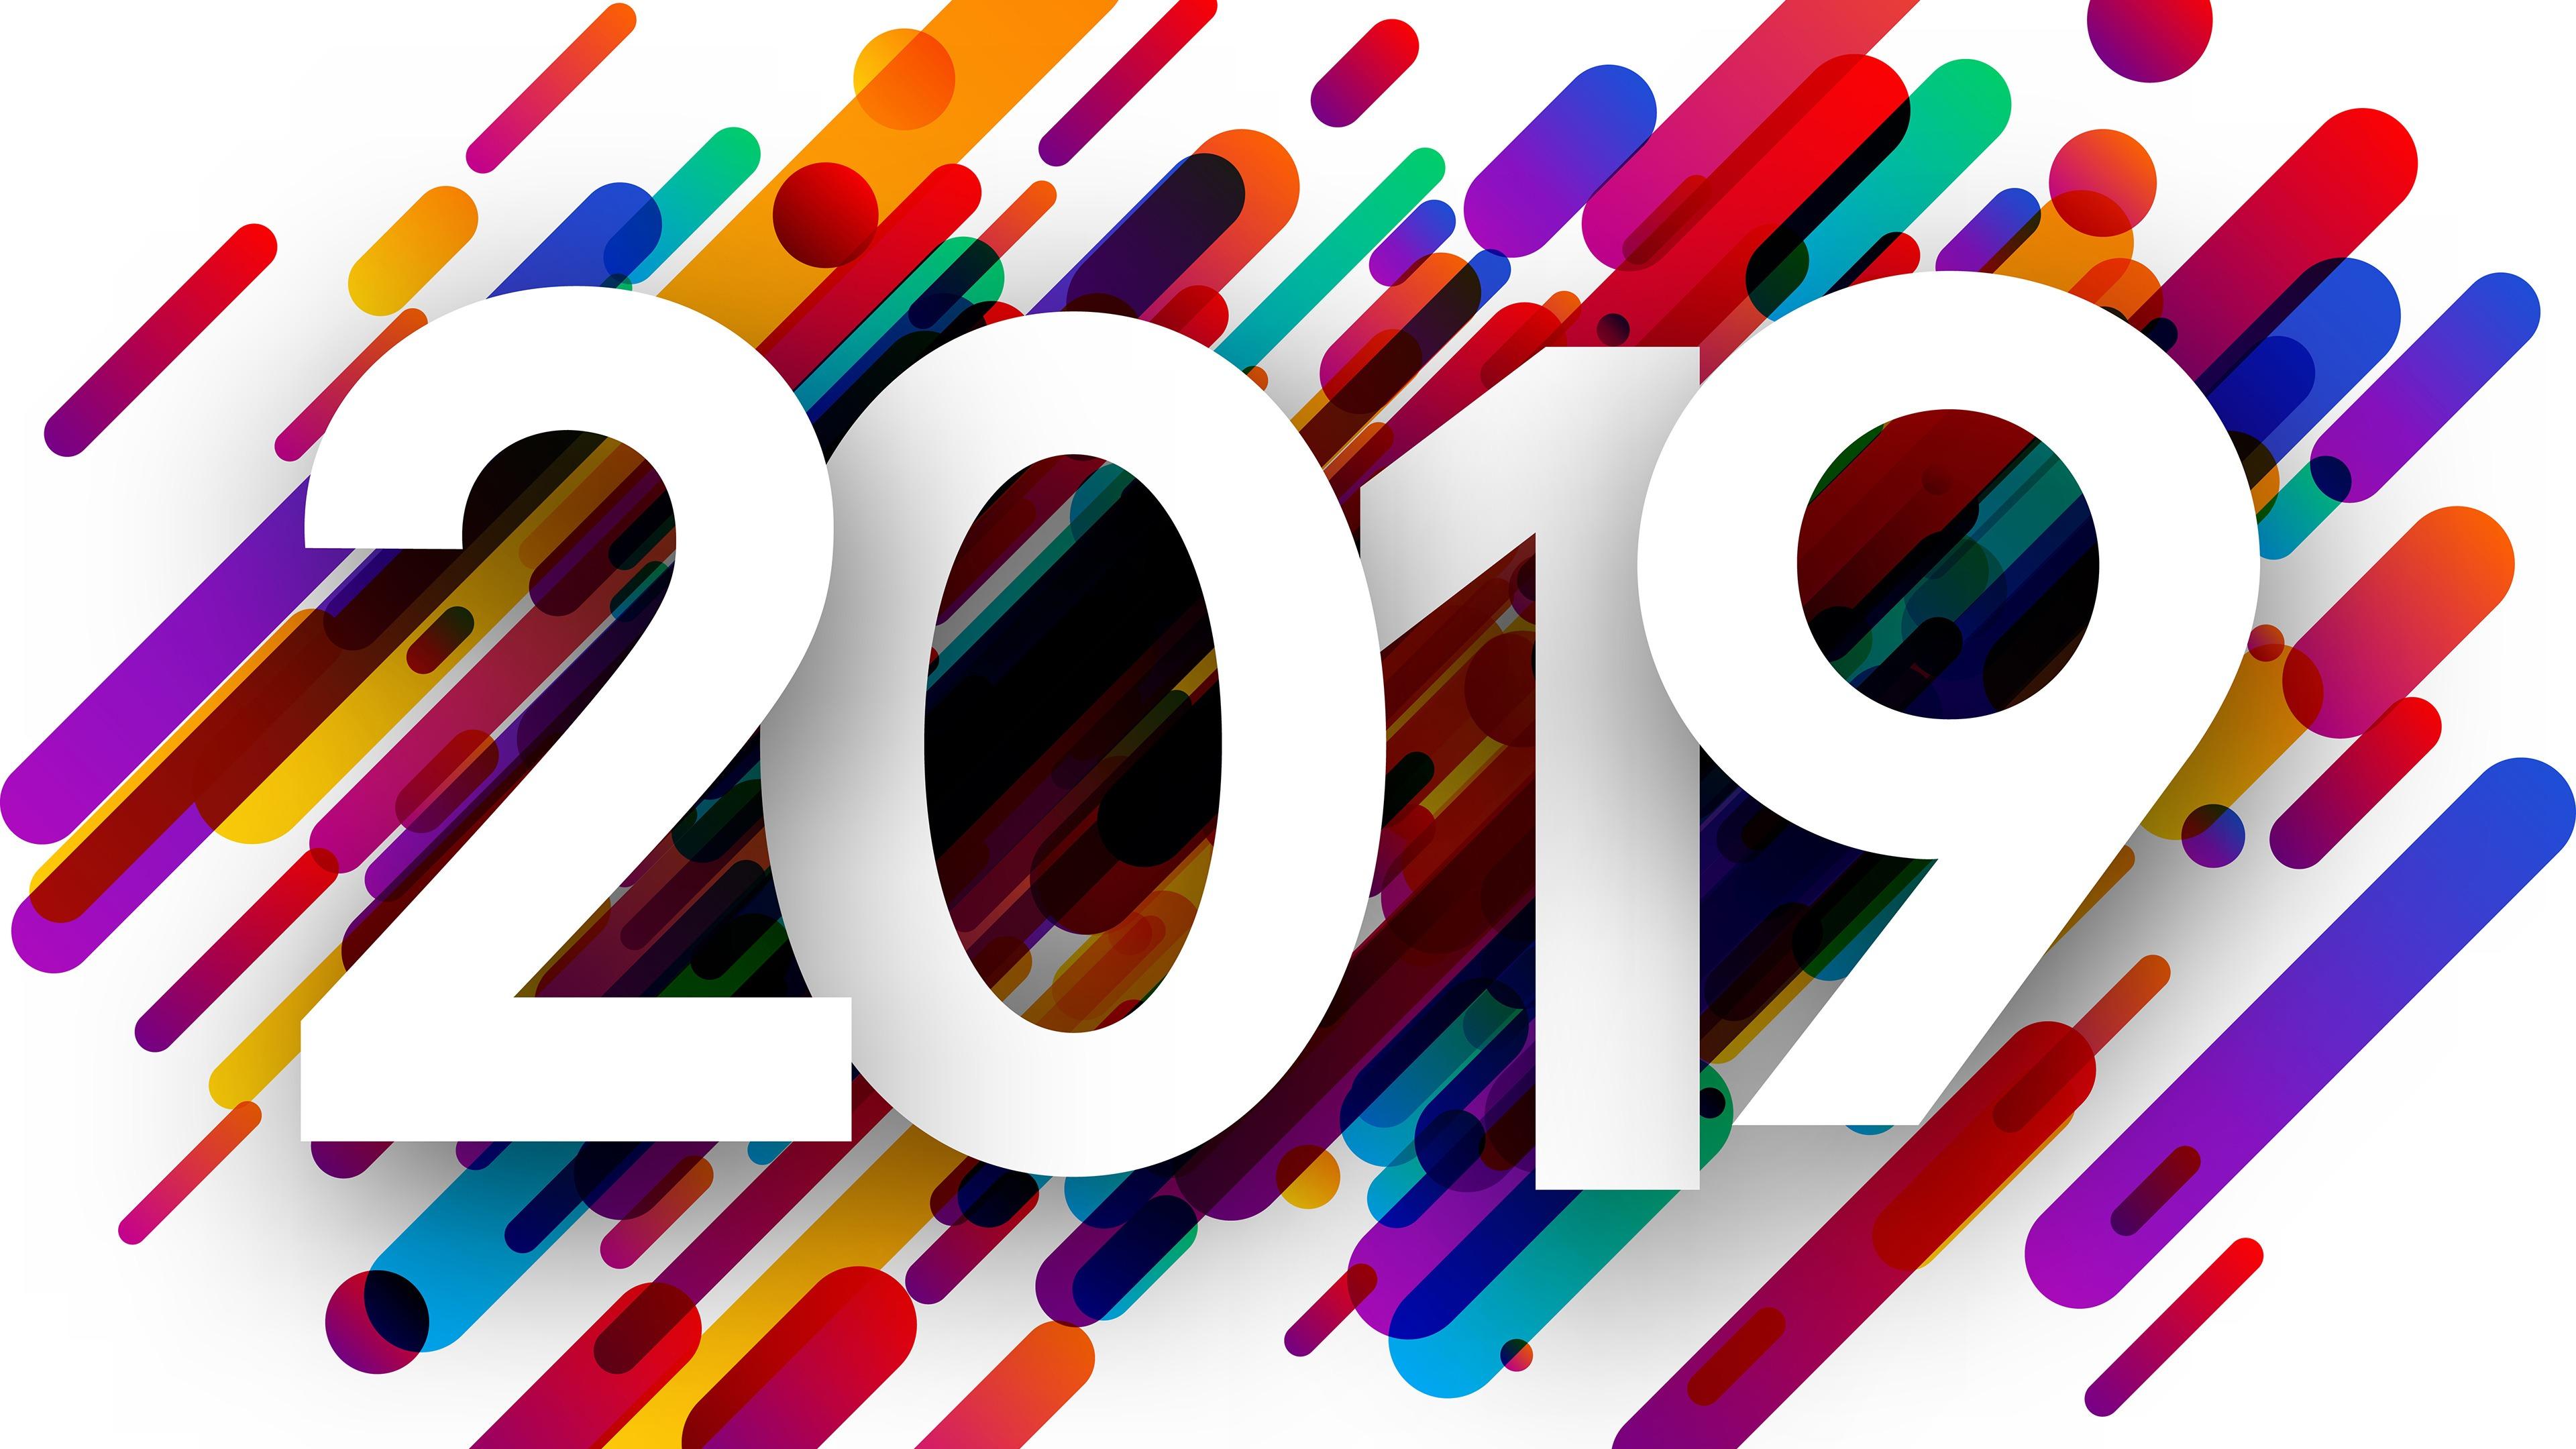 Samsung S4 Hd Wallpapers 2019: 2019, Bonne Année, HD, Bureau Aperçu